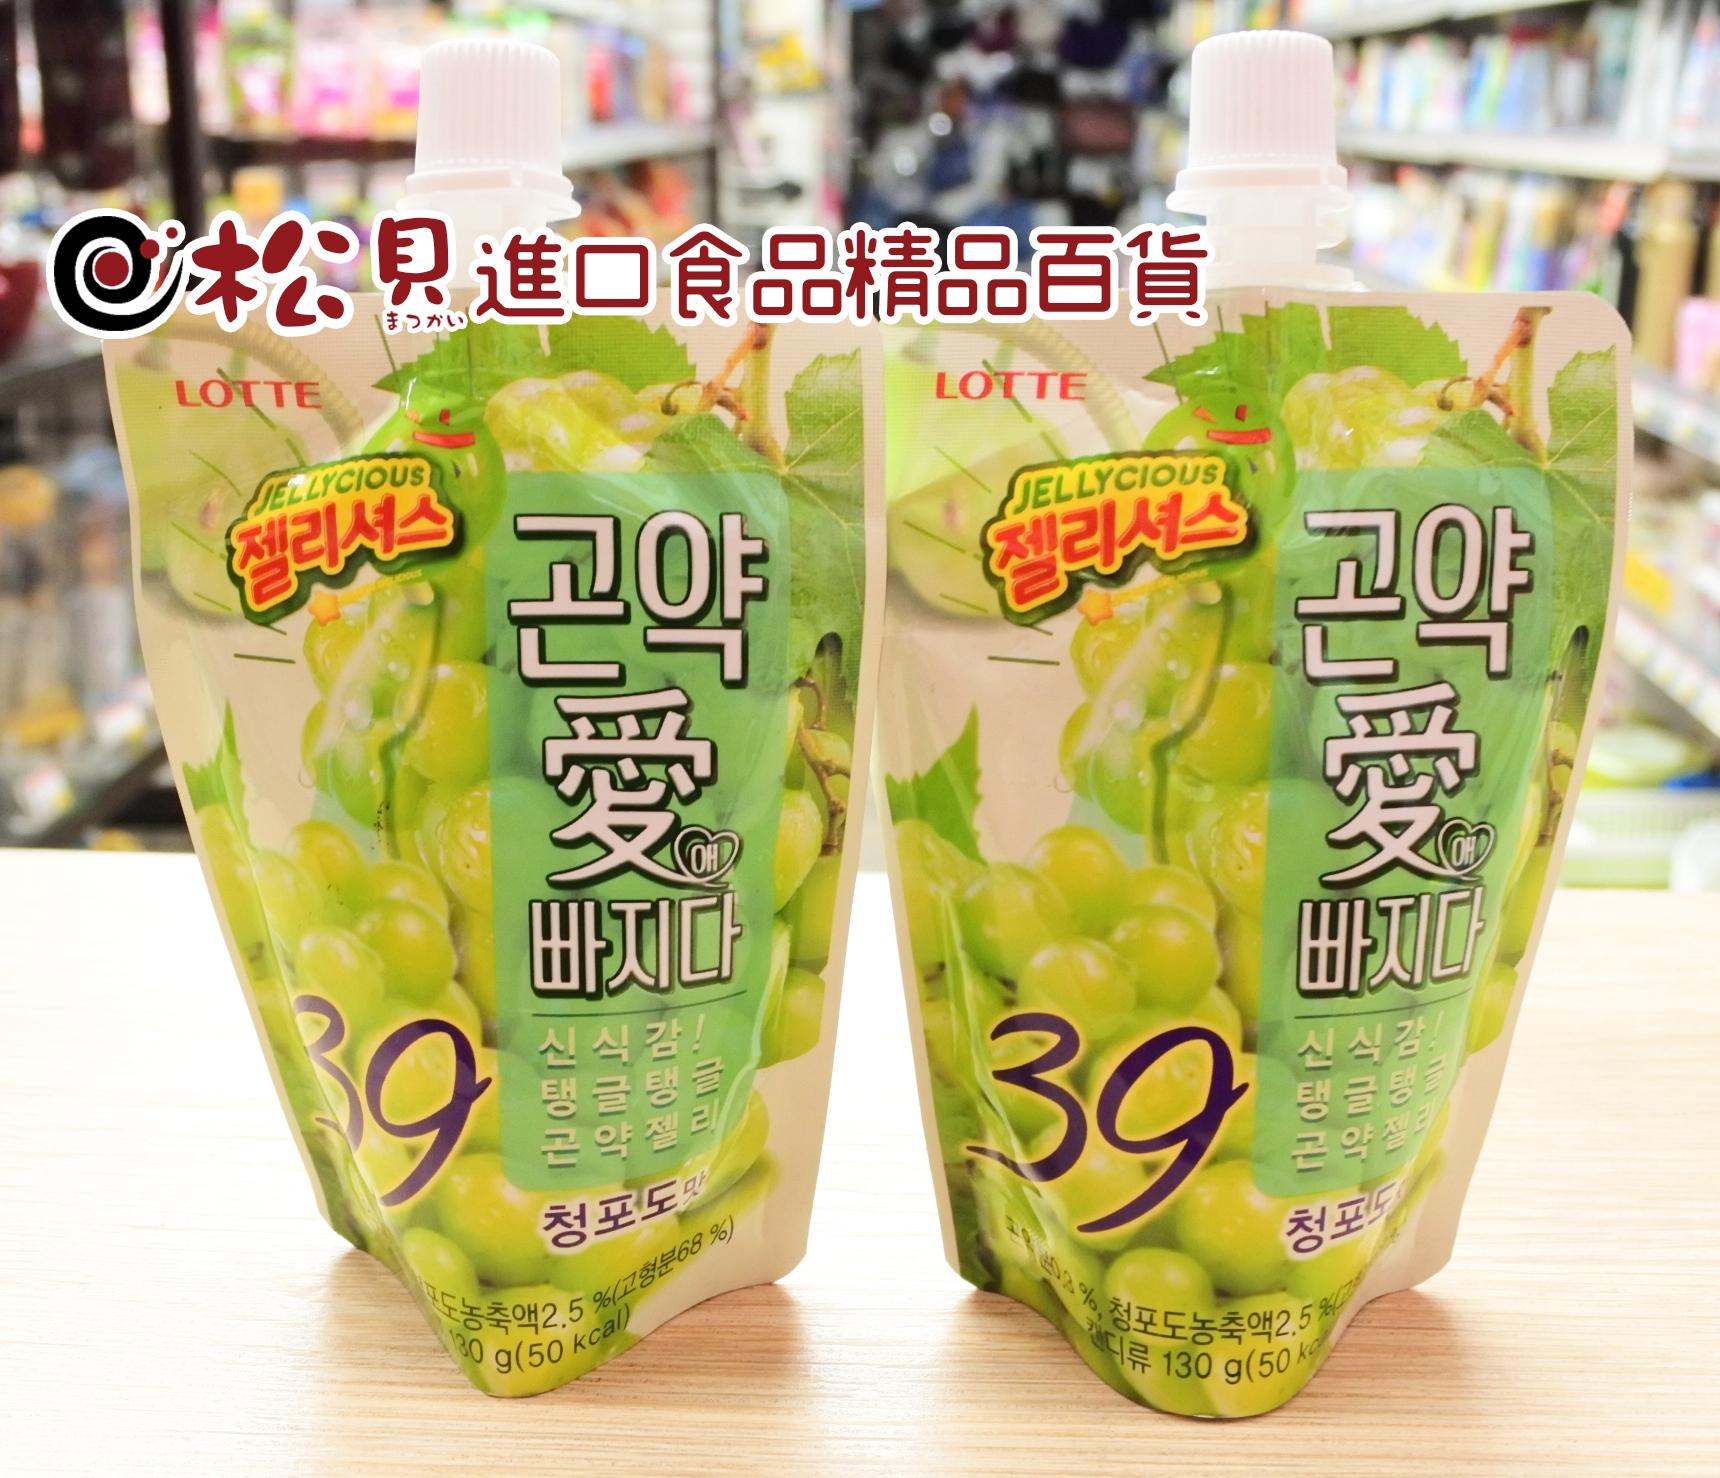 LOTTE白葡萄吸吸果凍130g.JPG